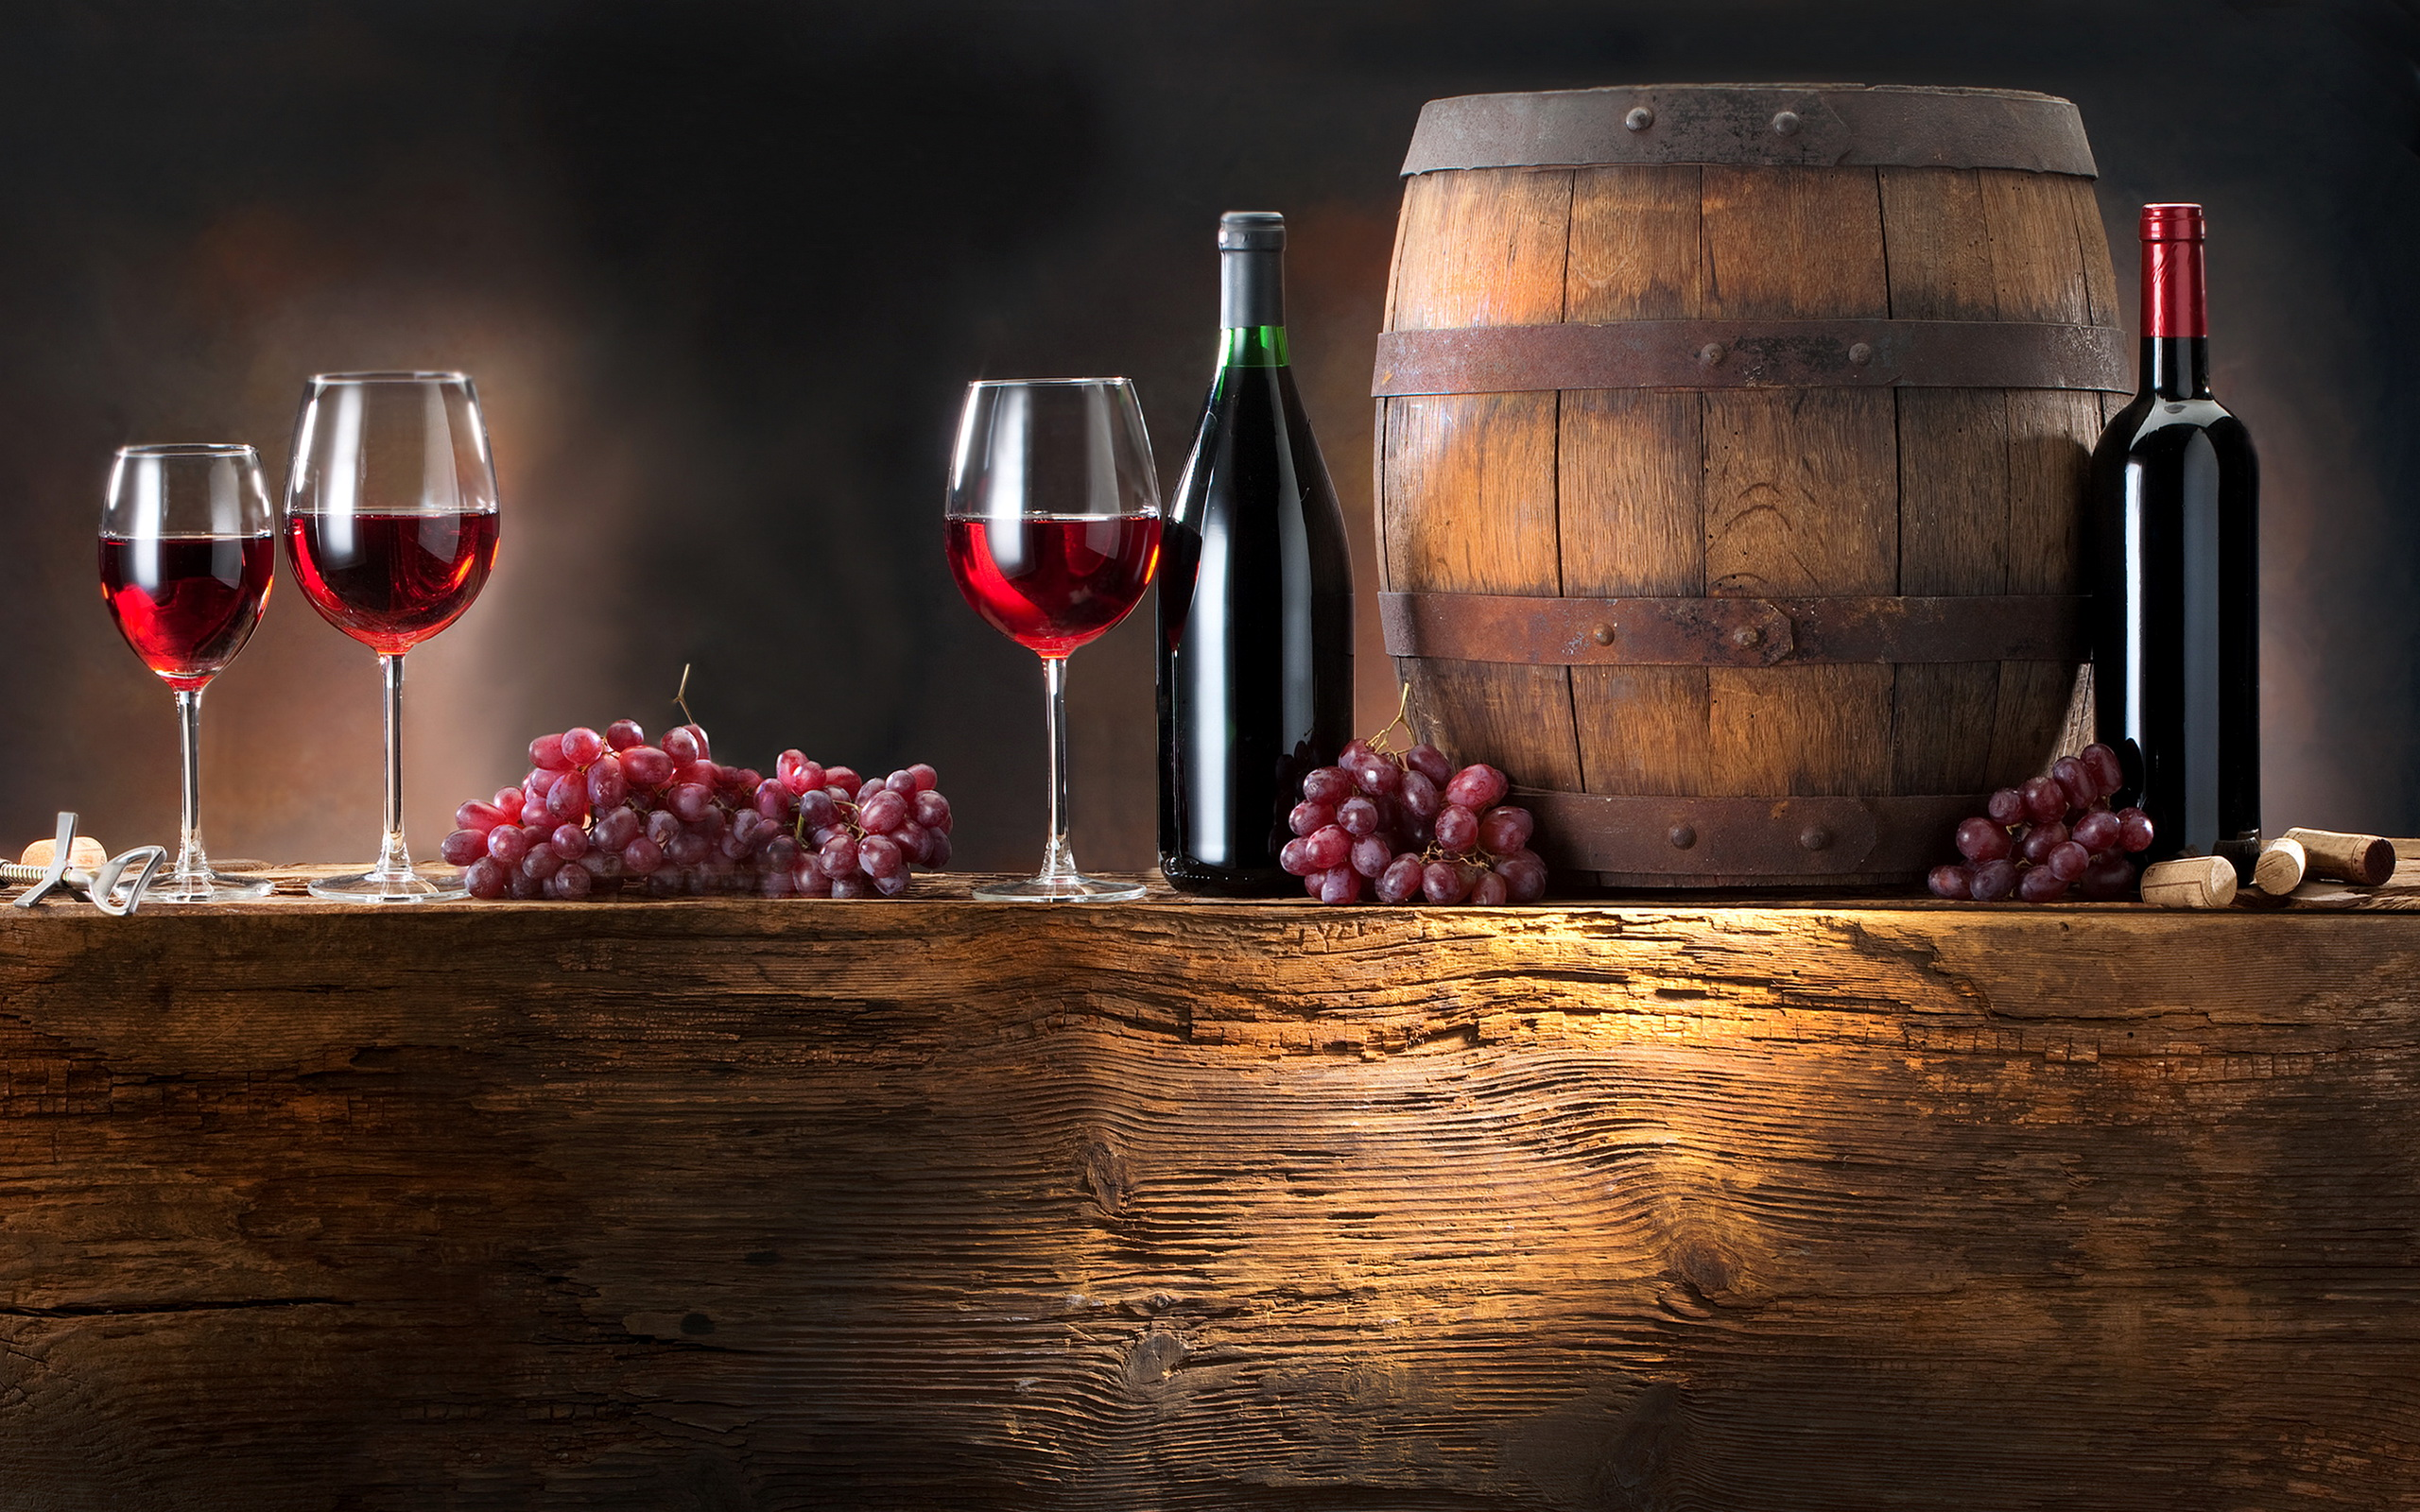 Дубовая бочка для вина, вино в бочках